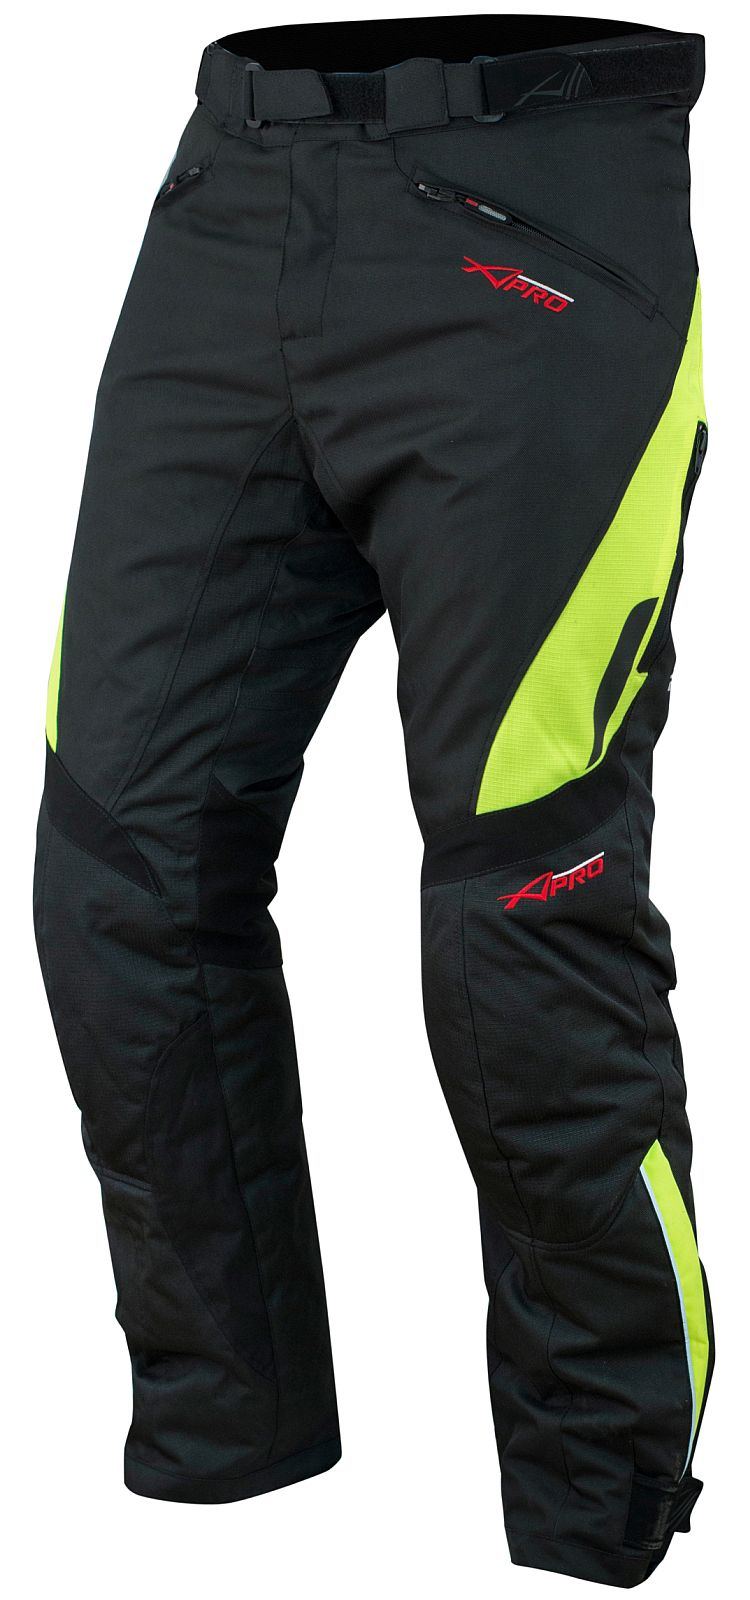 Pantaloni-Donna-Impermeabile-Moto-Imbottitura-Termica-Traspirante-Fluo miniatura 6